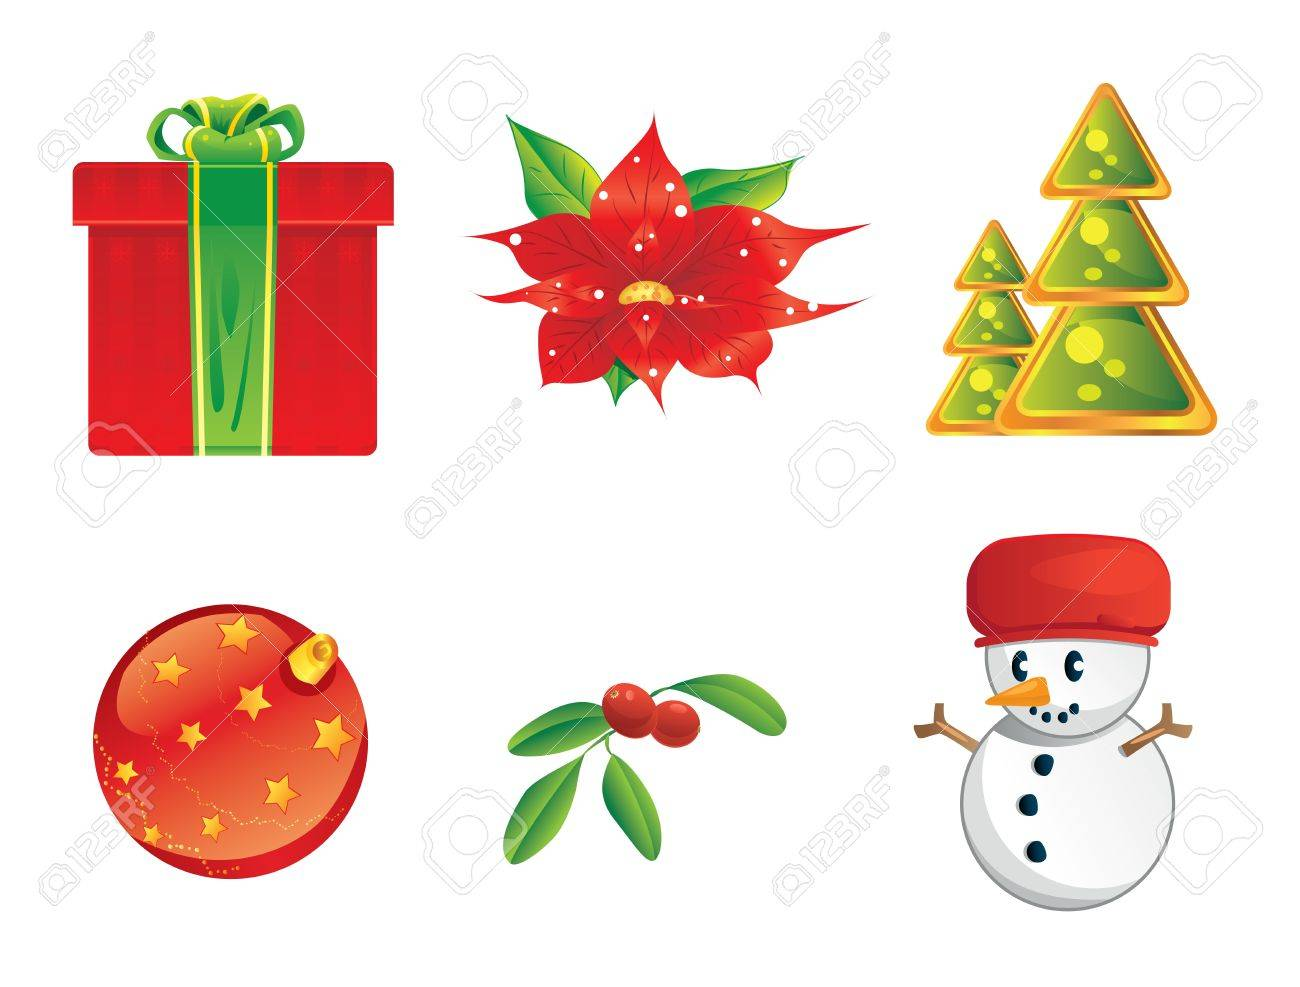 Christmas icons Stock Vector - 11141977